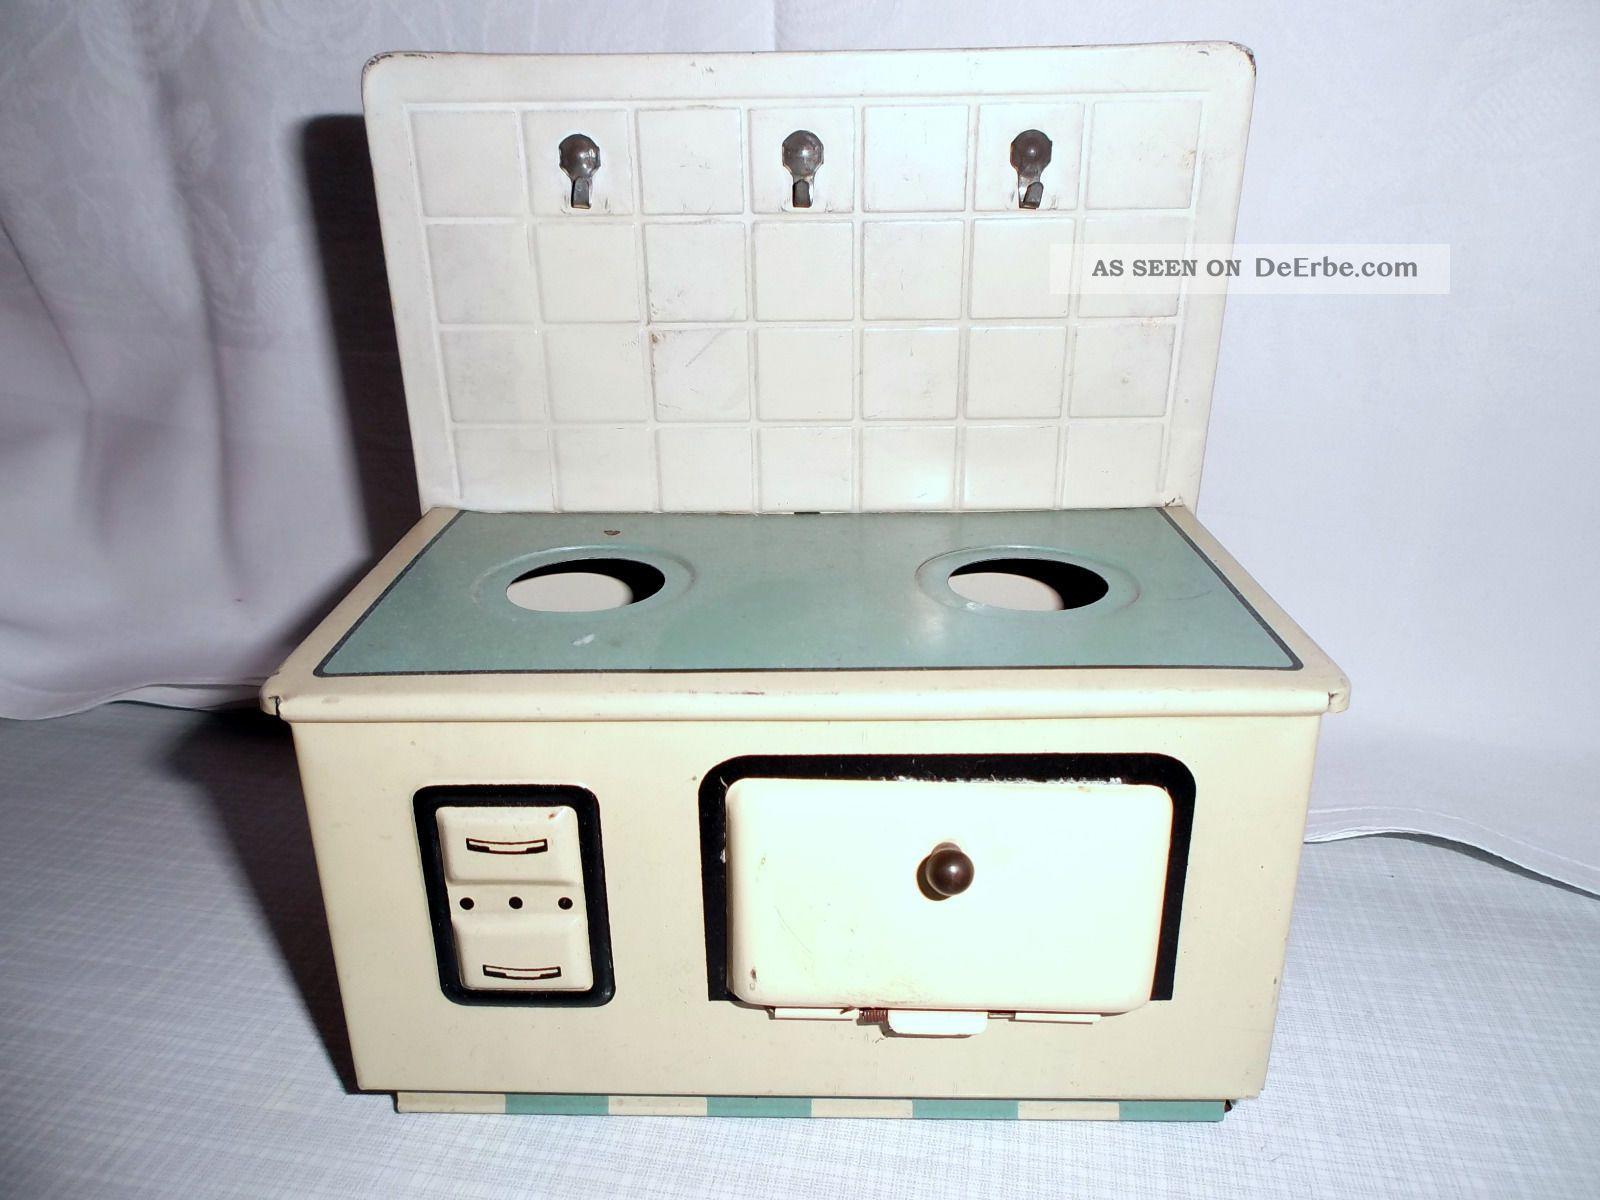 blechspielzeug ofen herd mit r ckwand alt cremfarbe gr n ofenplatte15x8 cm. Black Bedroom Furniture Sets. Home Design Ideas